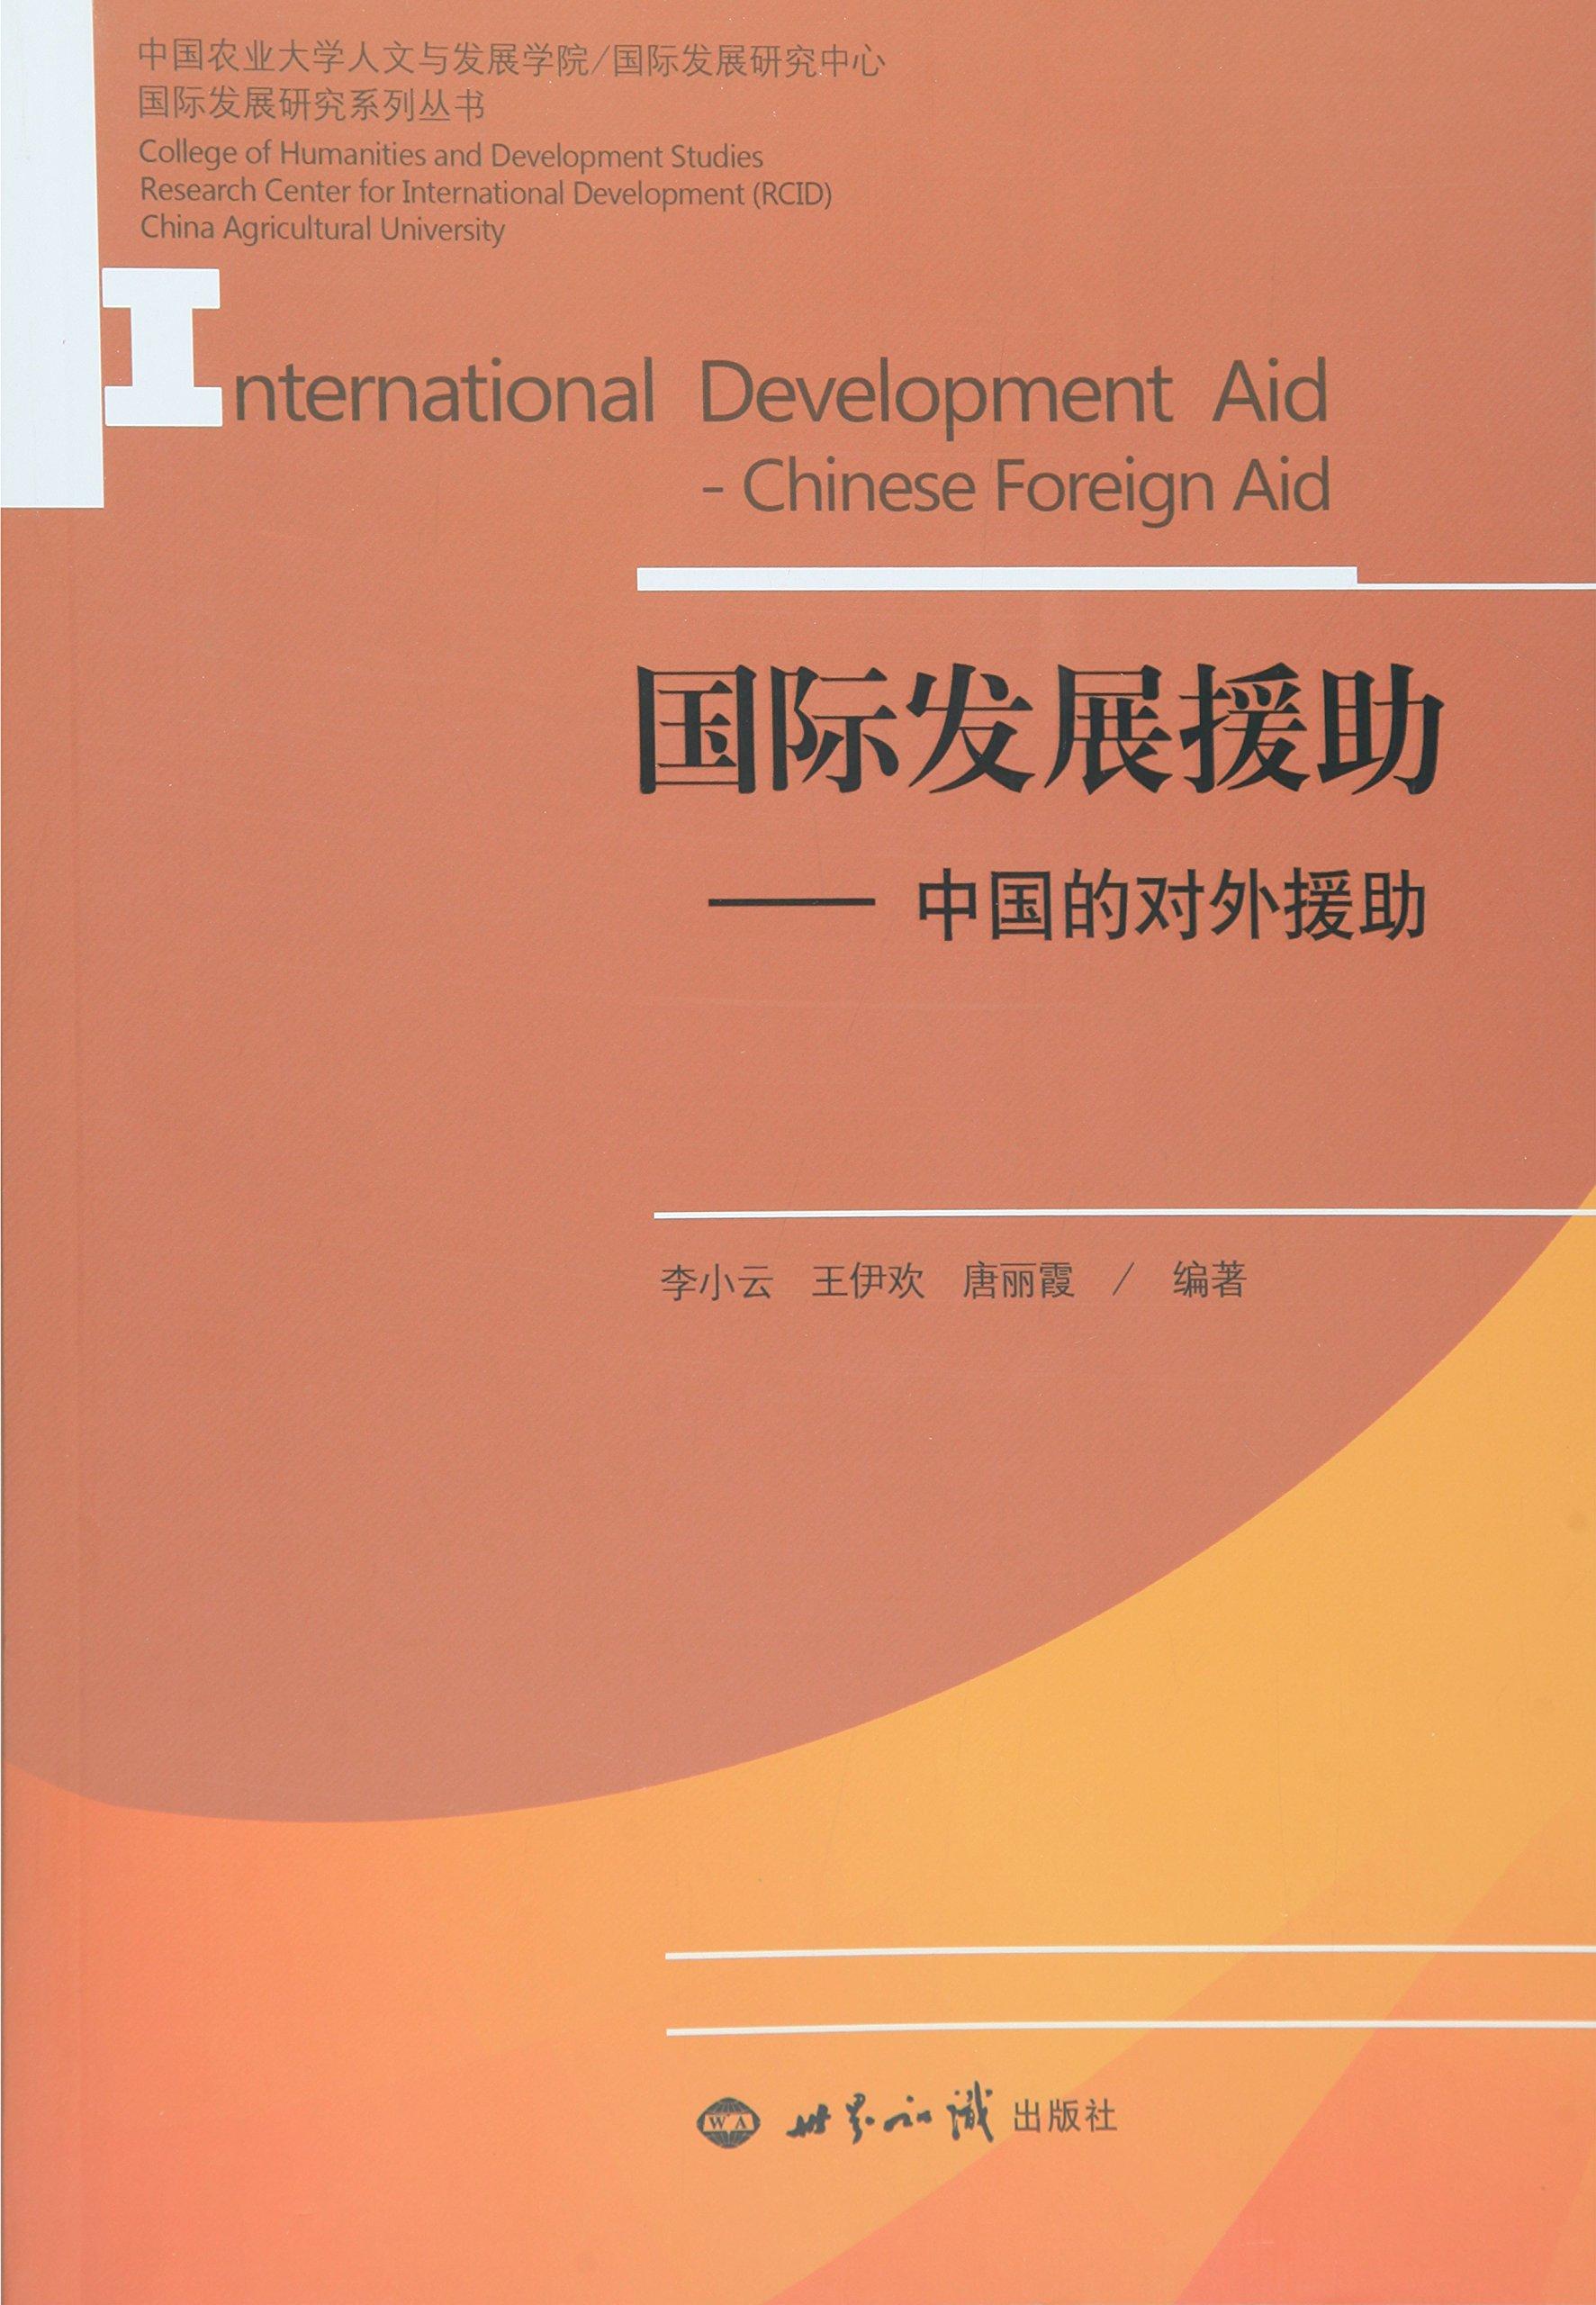 kitchen aid wall oven design your own 国际发展援助 中国对外援助 李小云 摘要书评试读 图书